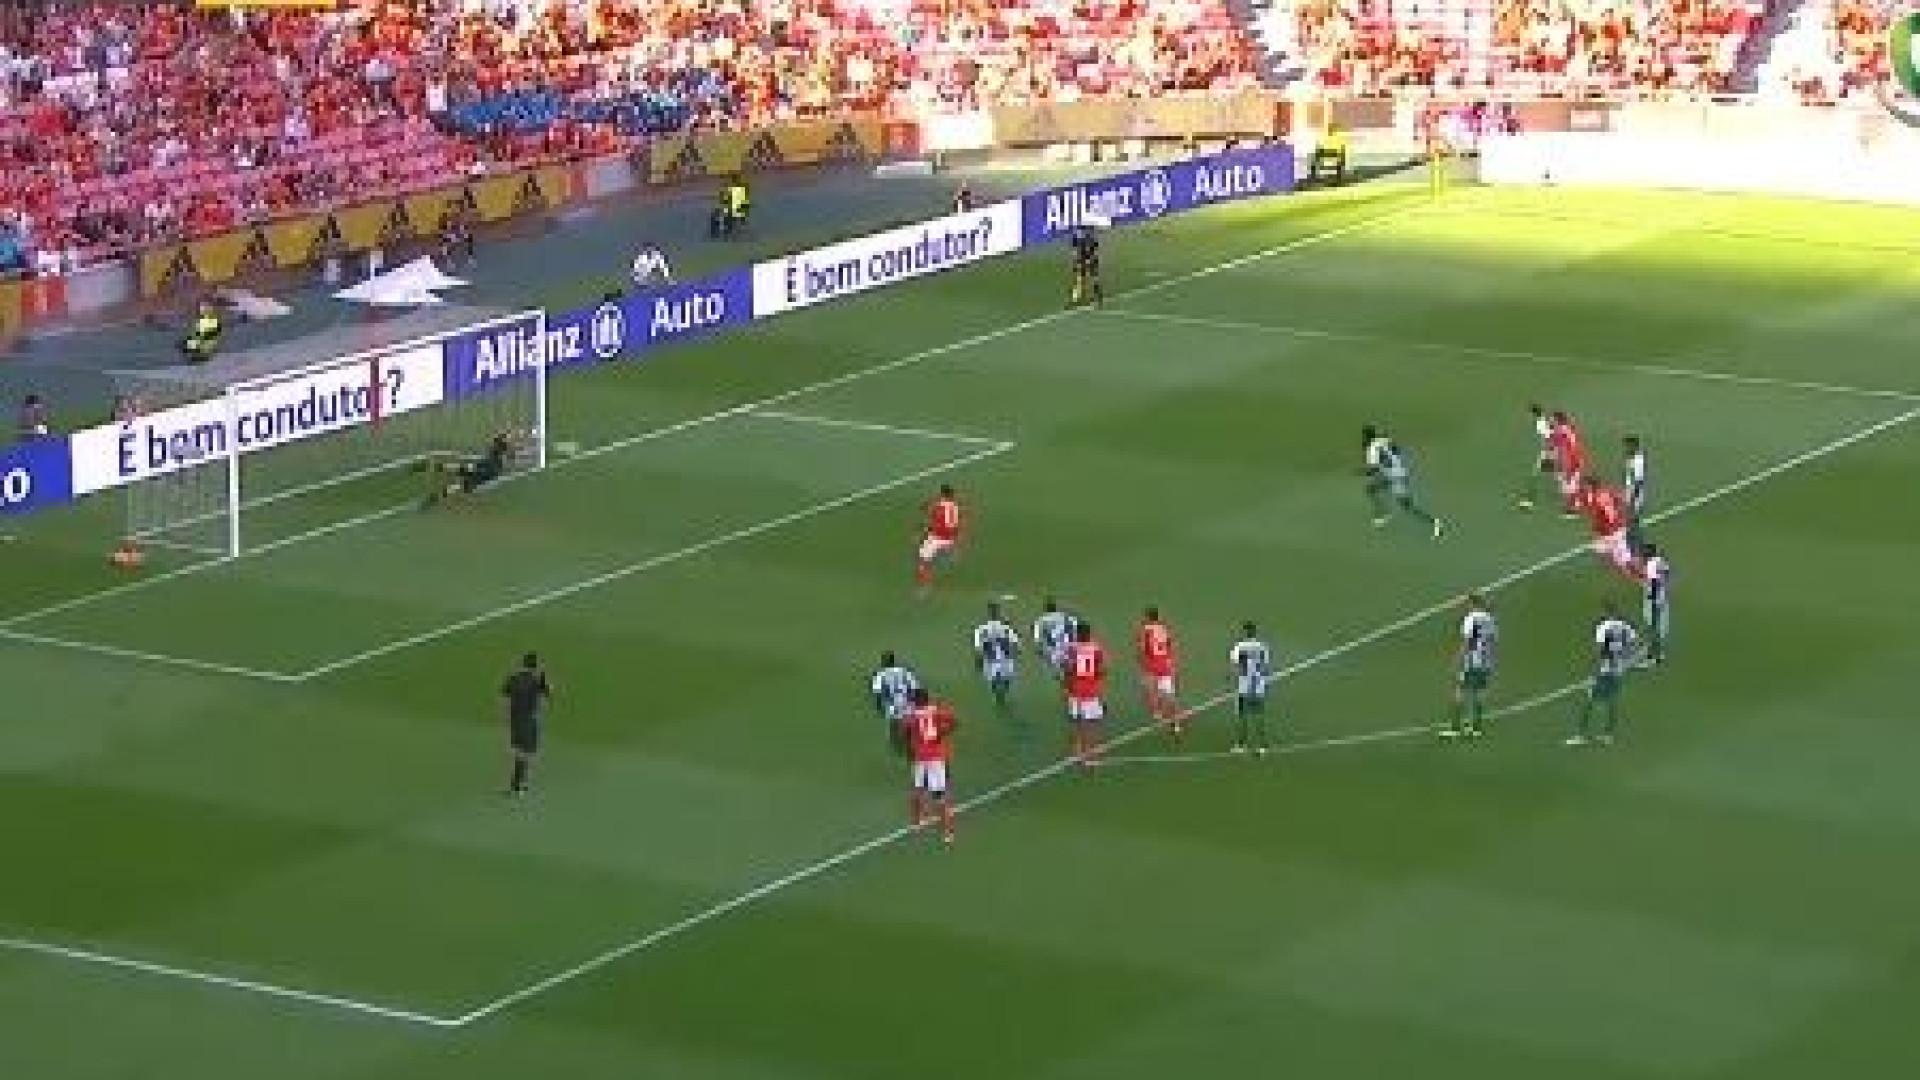 Salvio marca de grande penalidade após falta de Gabriel sobre Seferovic